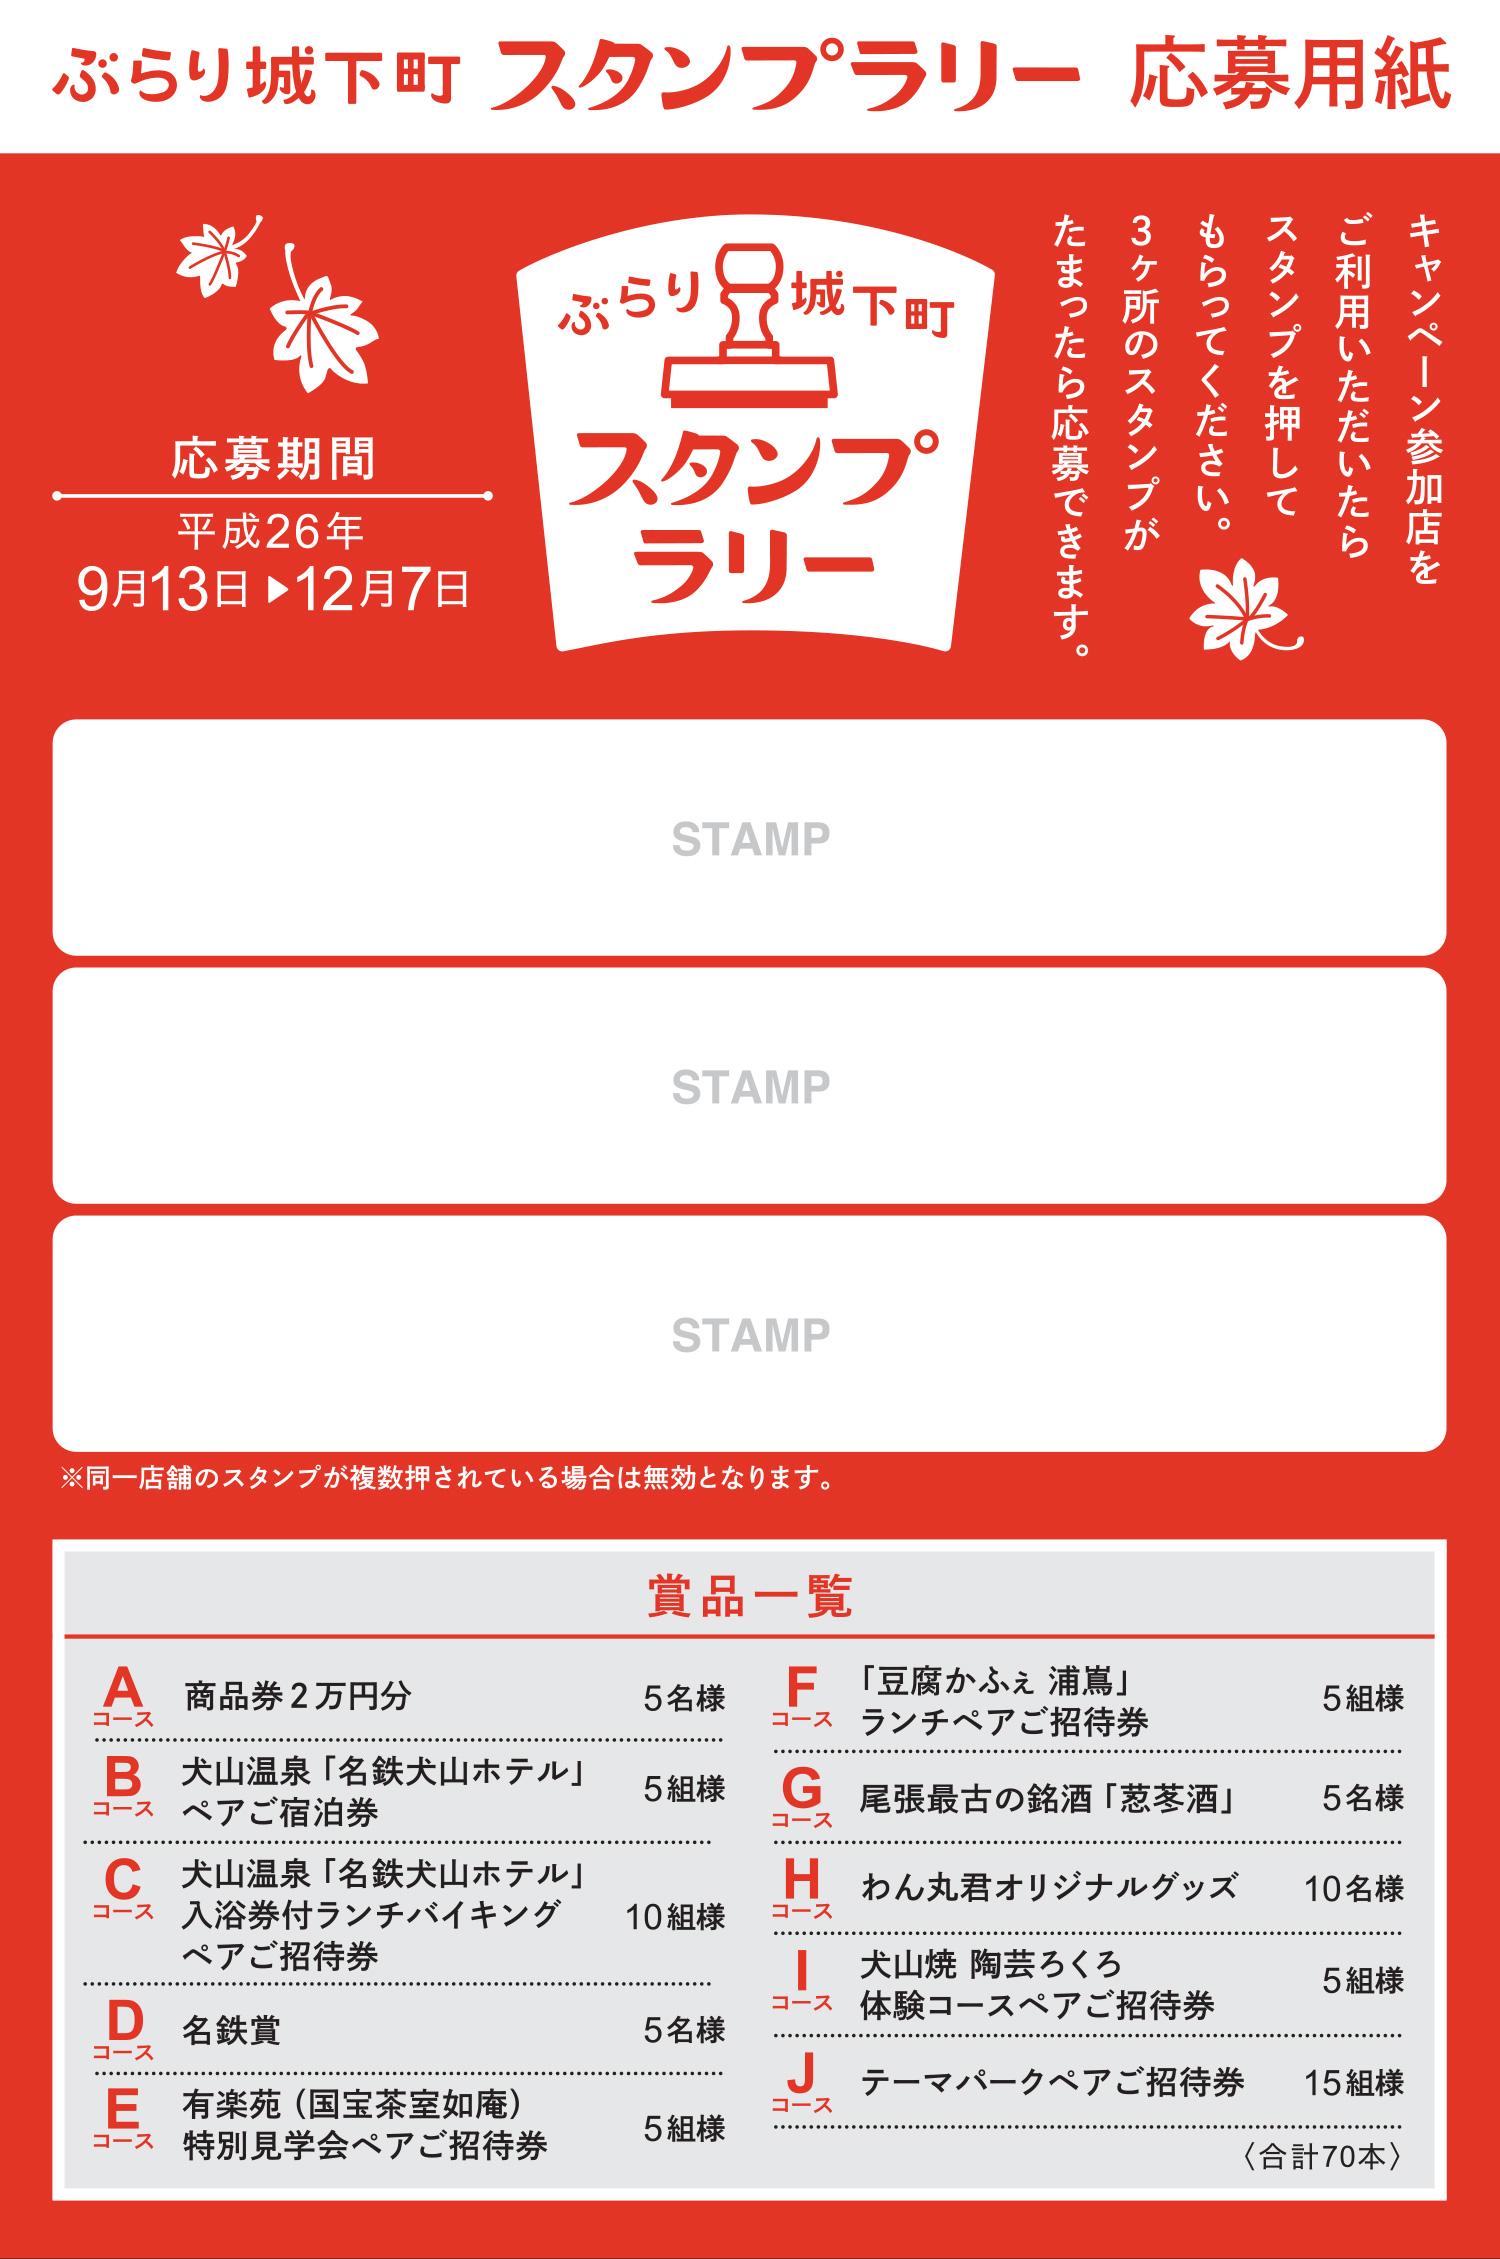 MIHON-stamp-a-2014-fin